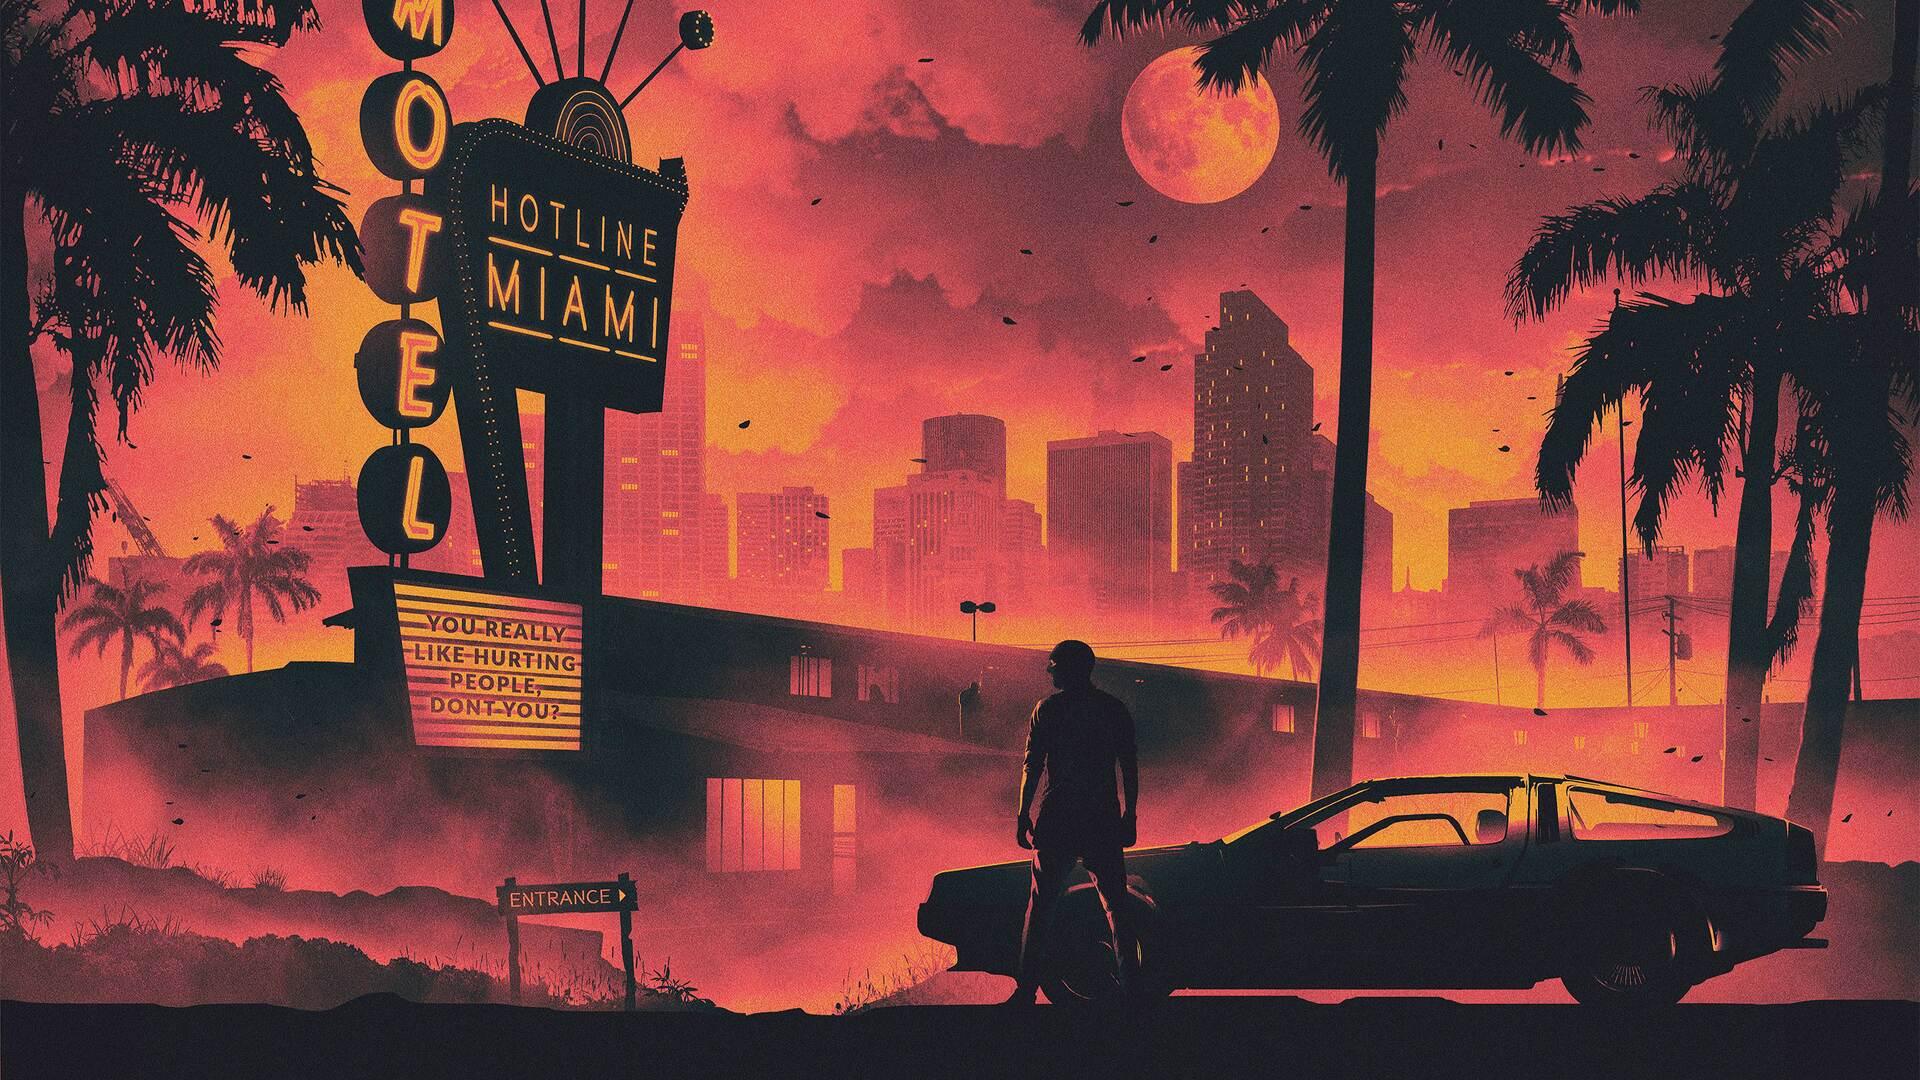 1920x1080 Hotline Miami Game Retro Style Dark Life ...